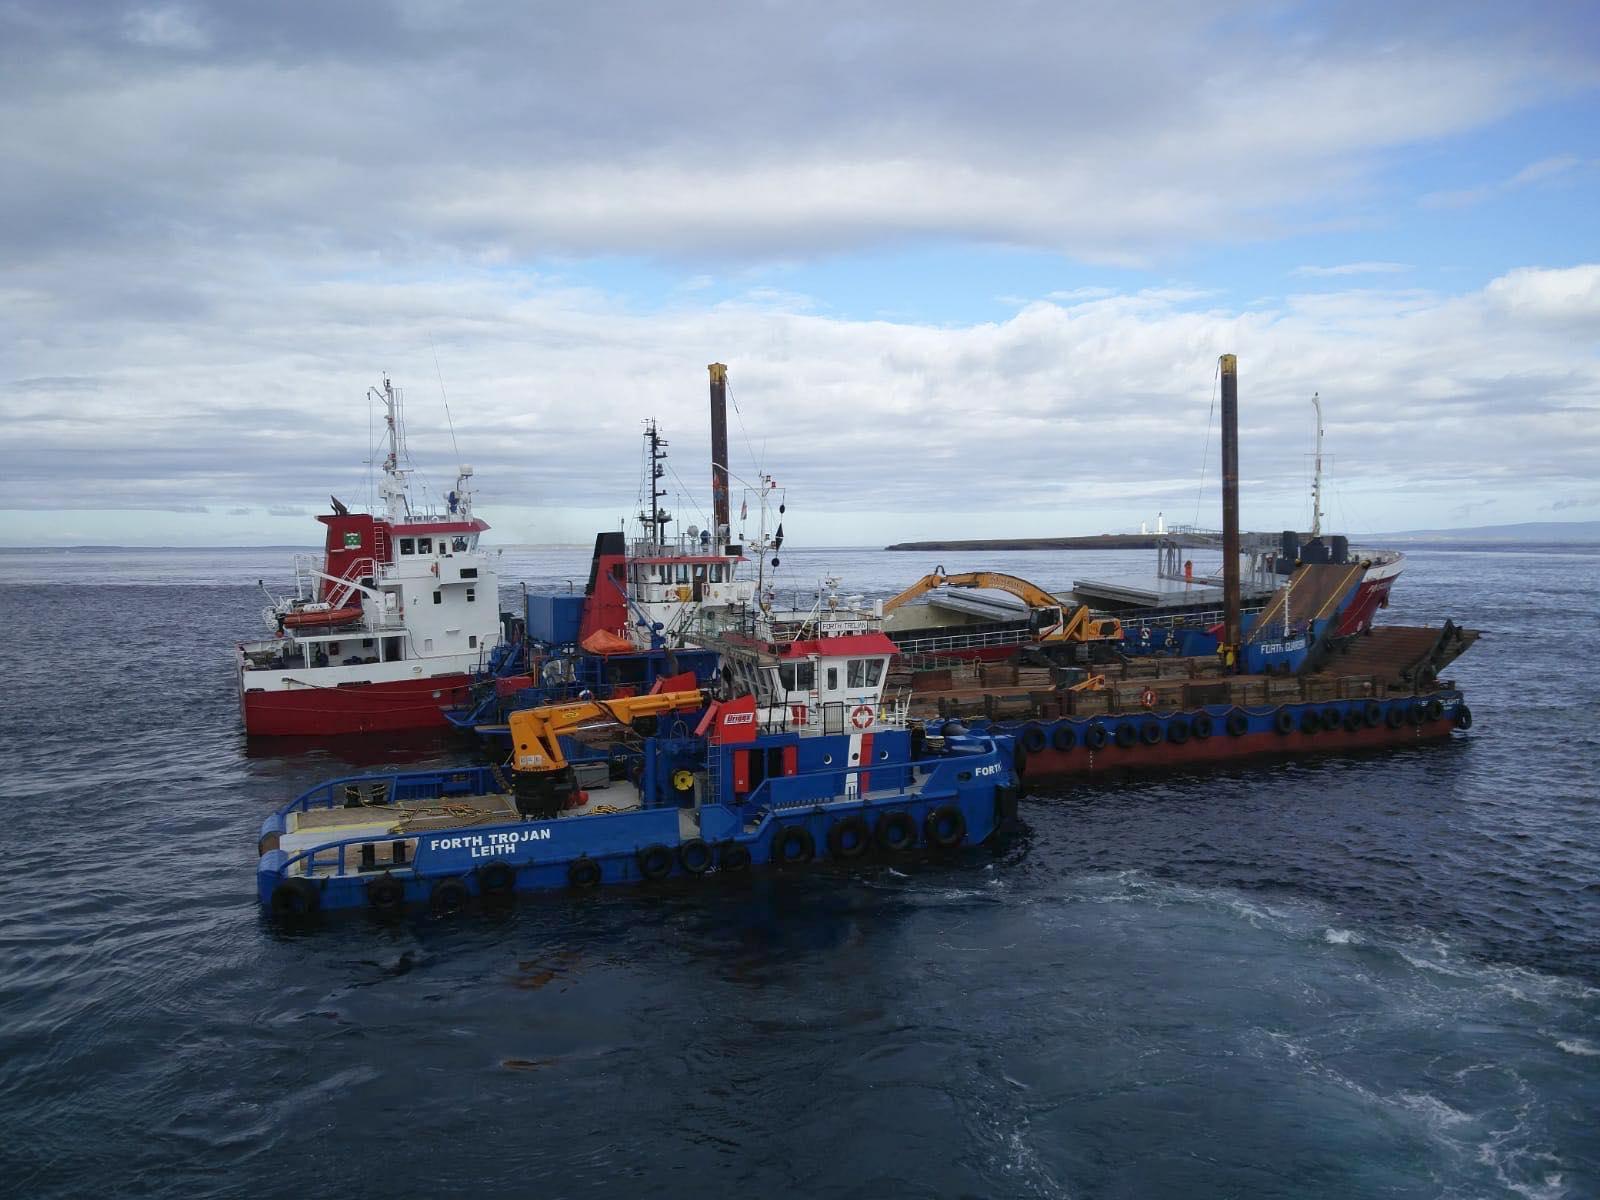 MV Priscilla: 're-float plans progressing well' - The